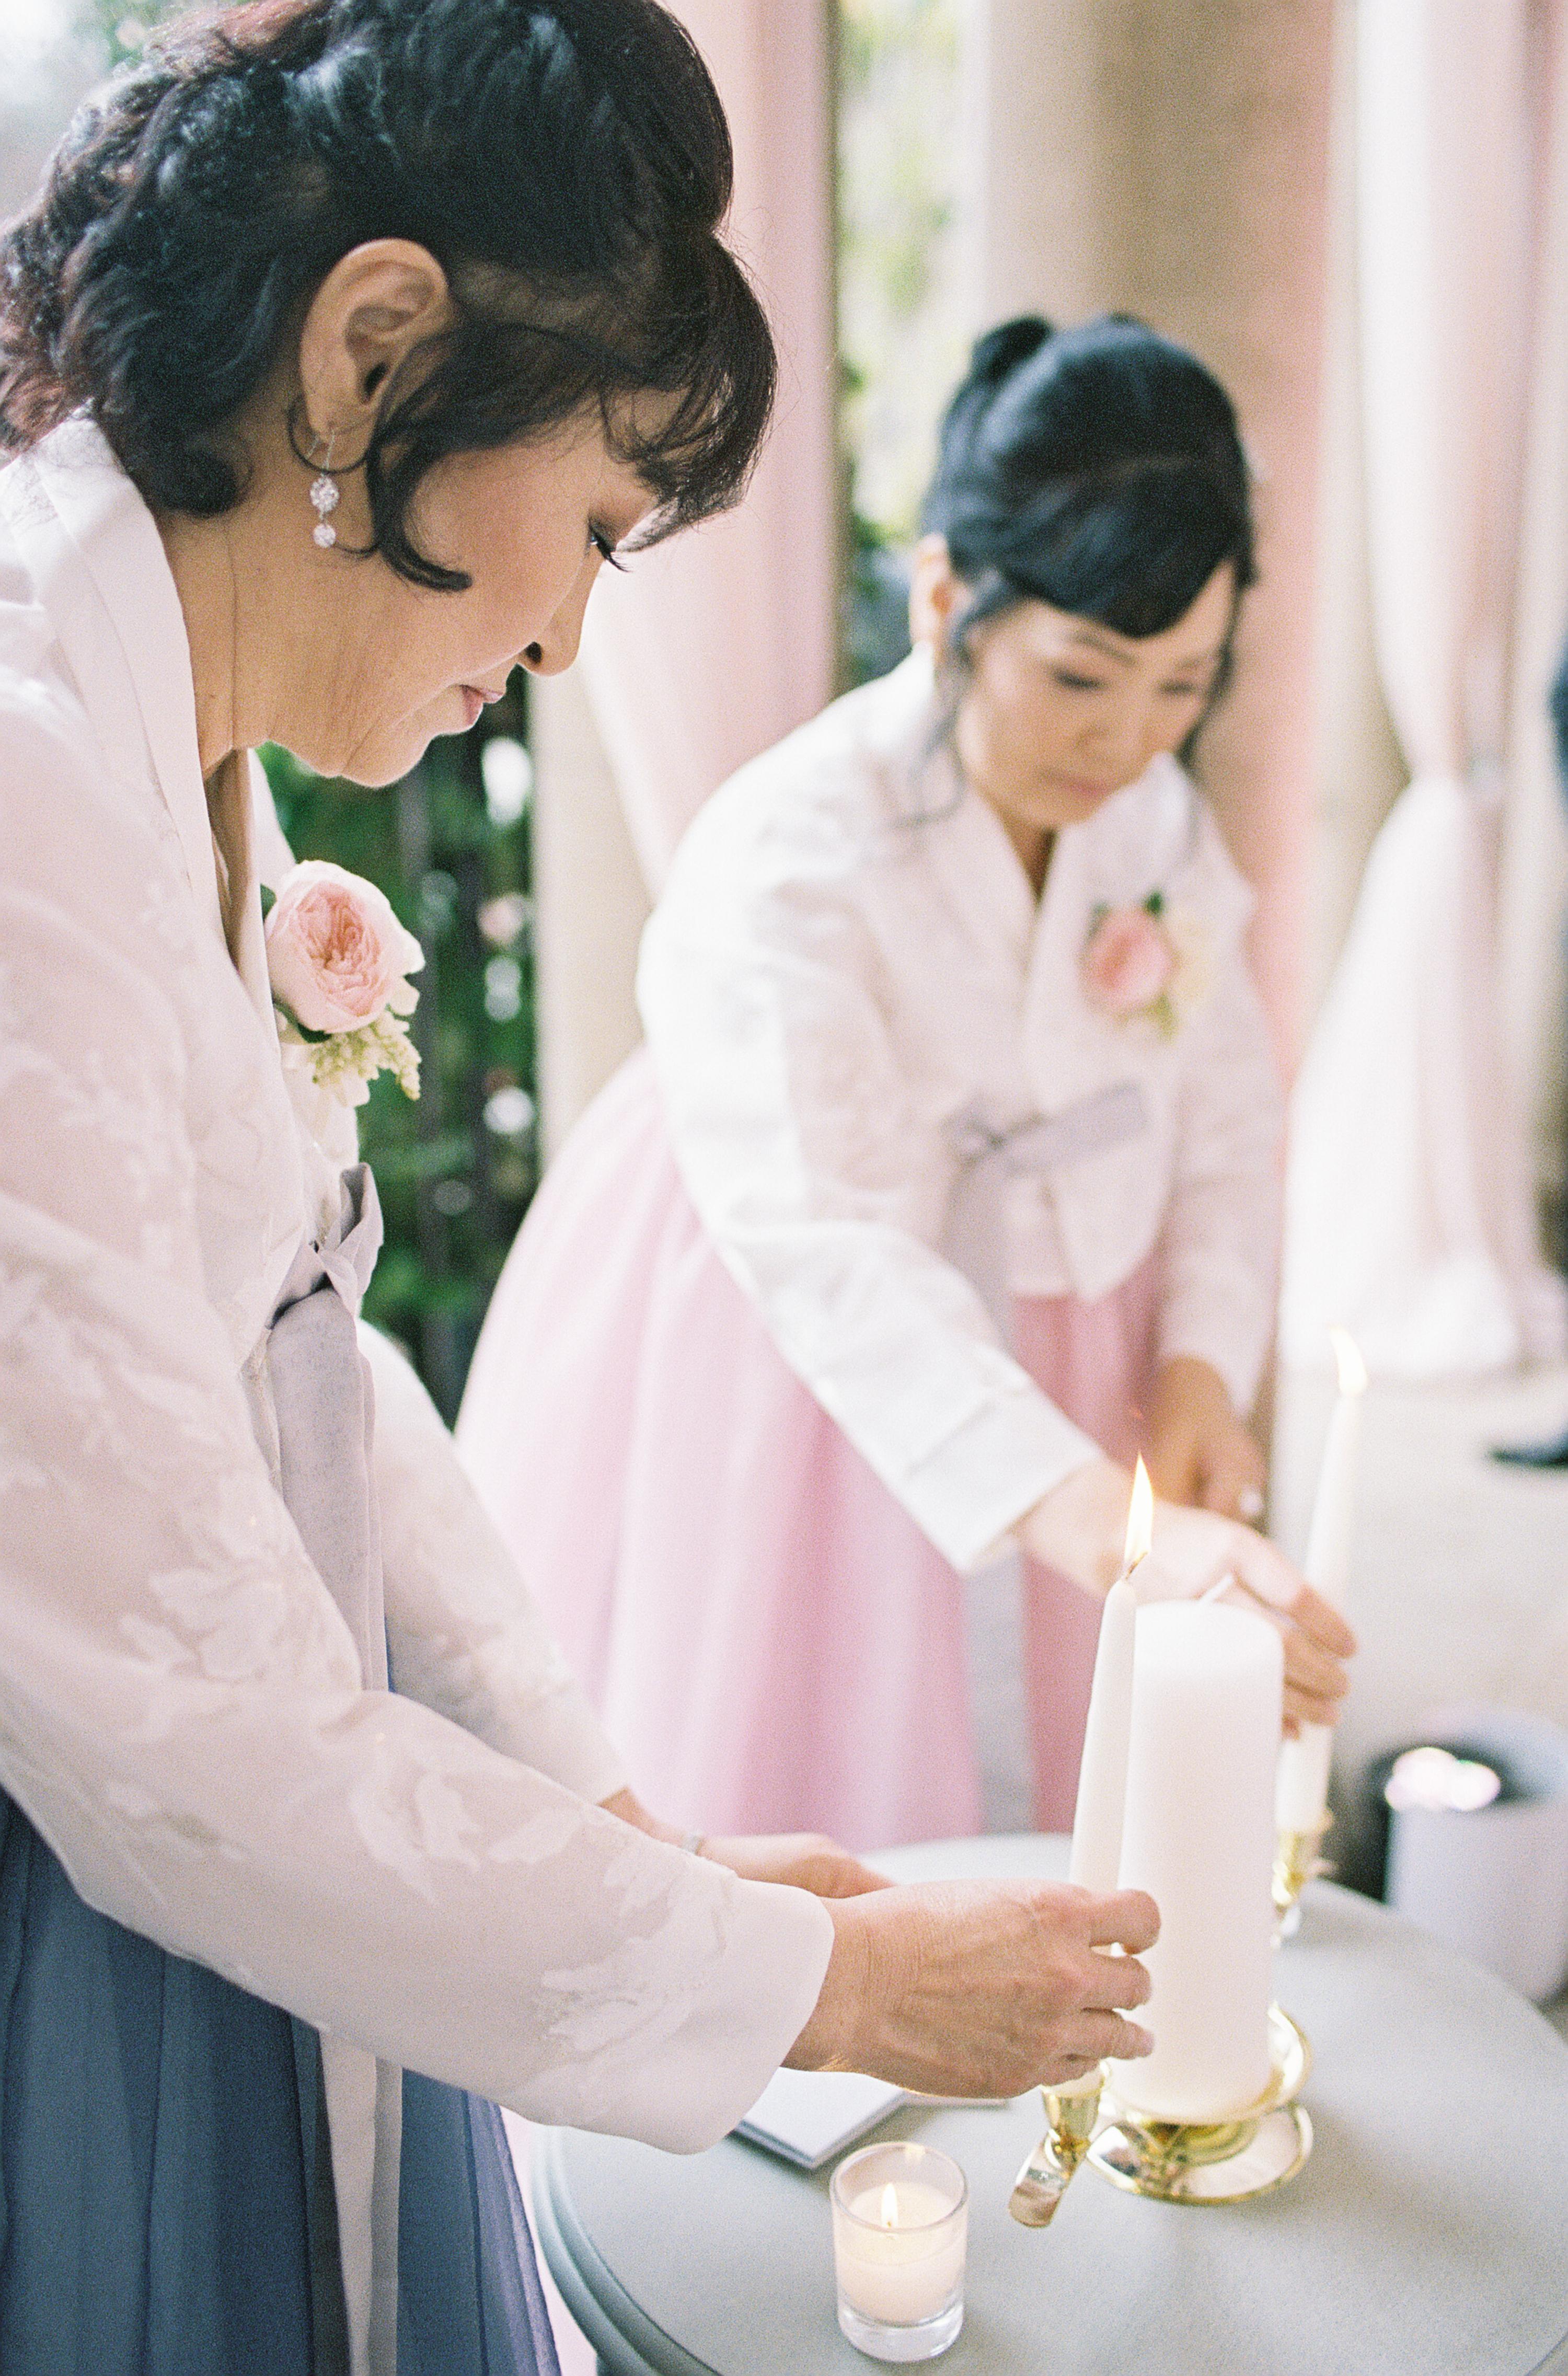 Athenaeum_Wedding_Hi_Res-51-Jen_Huang-005184-R1-007